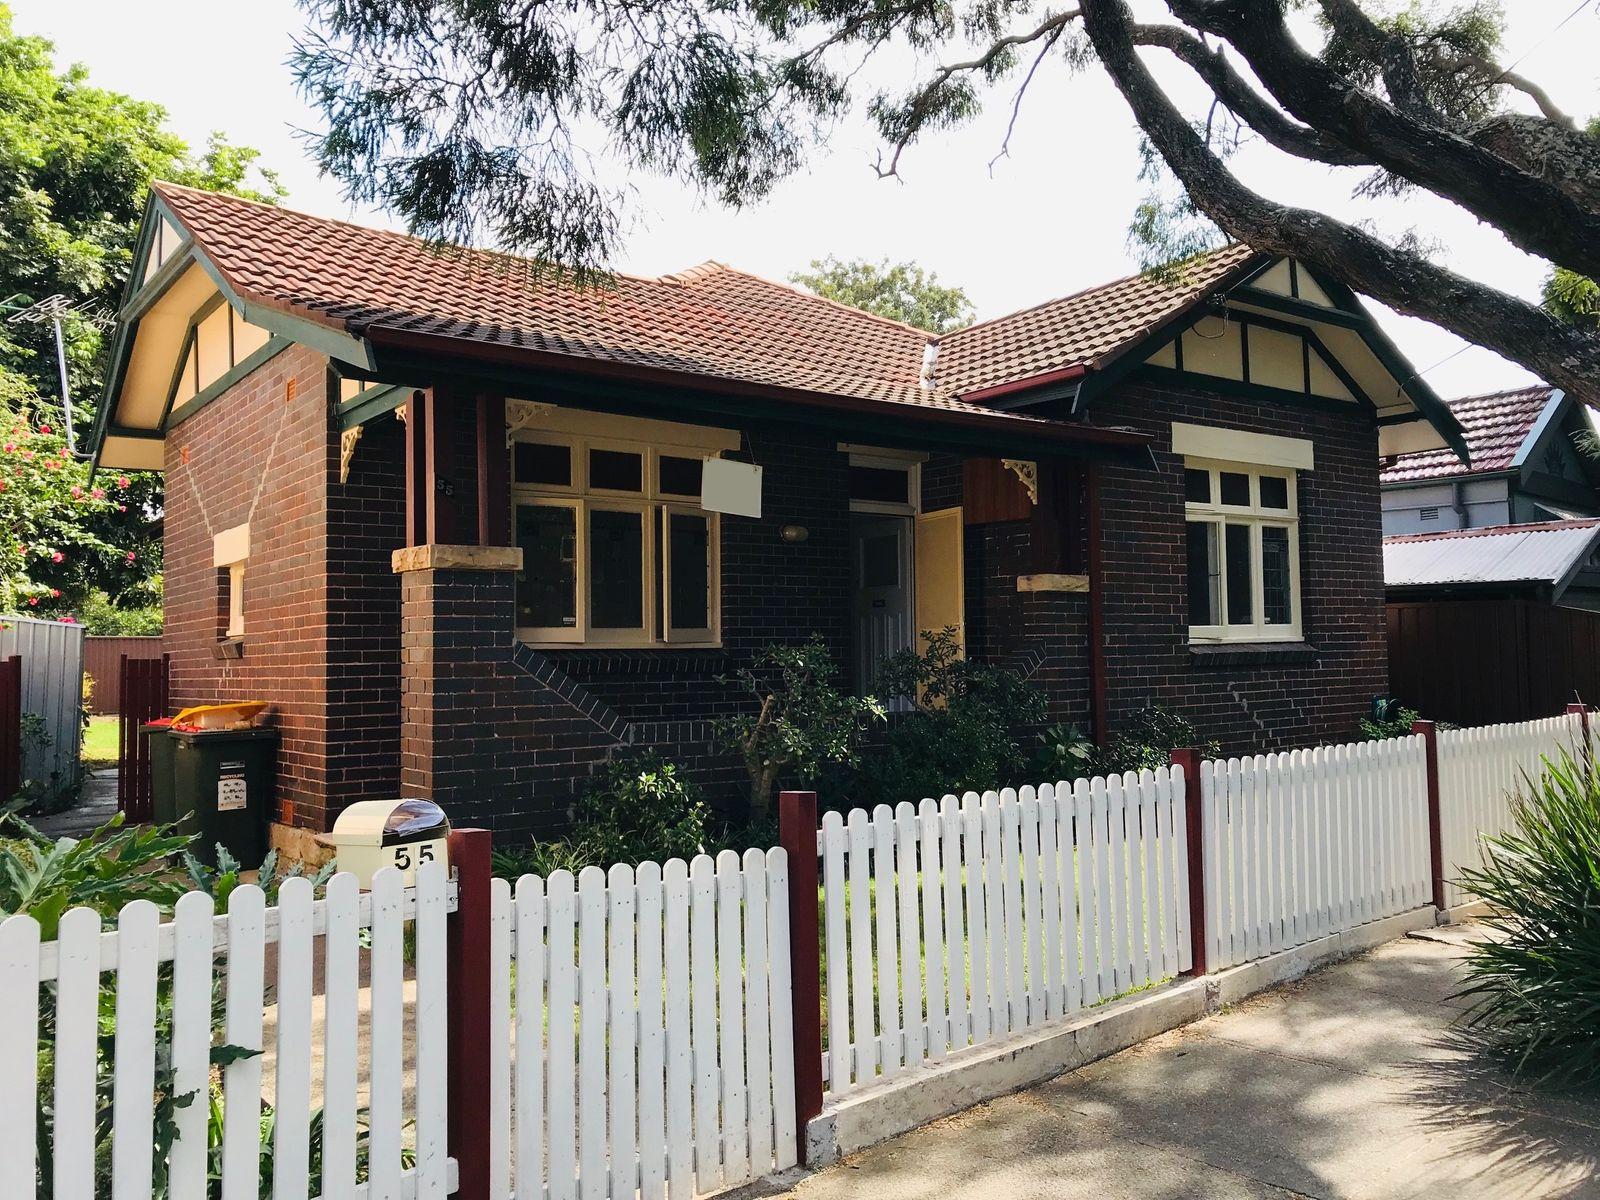 55 Petersham Road, Marrickville, NSW 2204